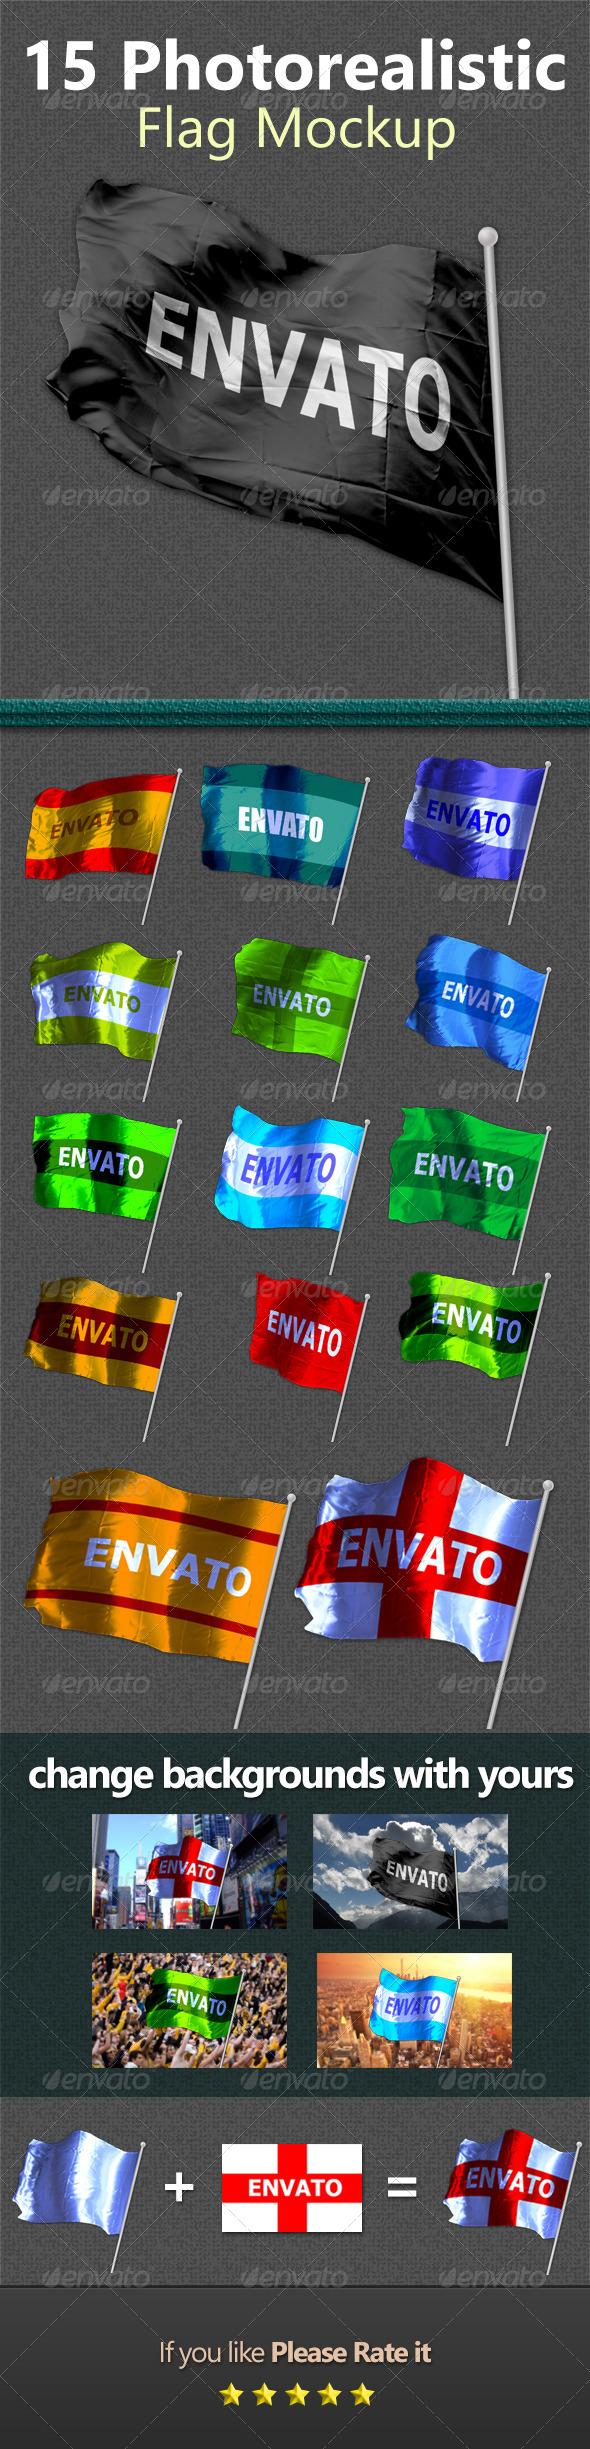 GraphicRiver 15 Photorealistic Flag Mockups 4602912